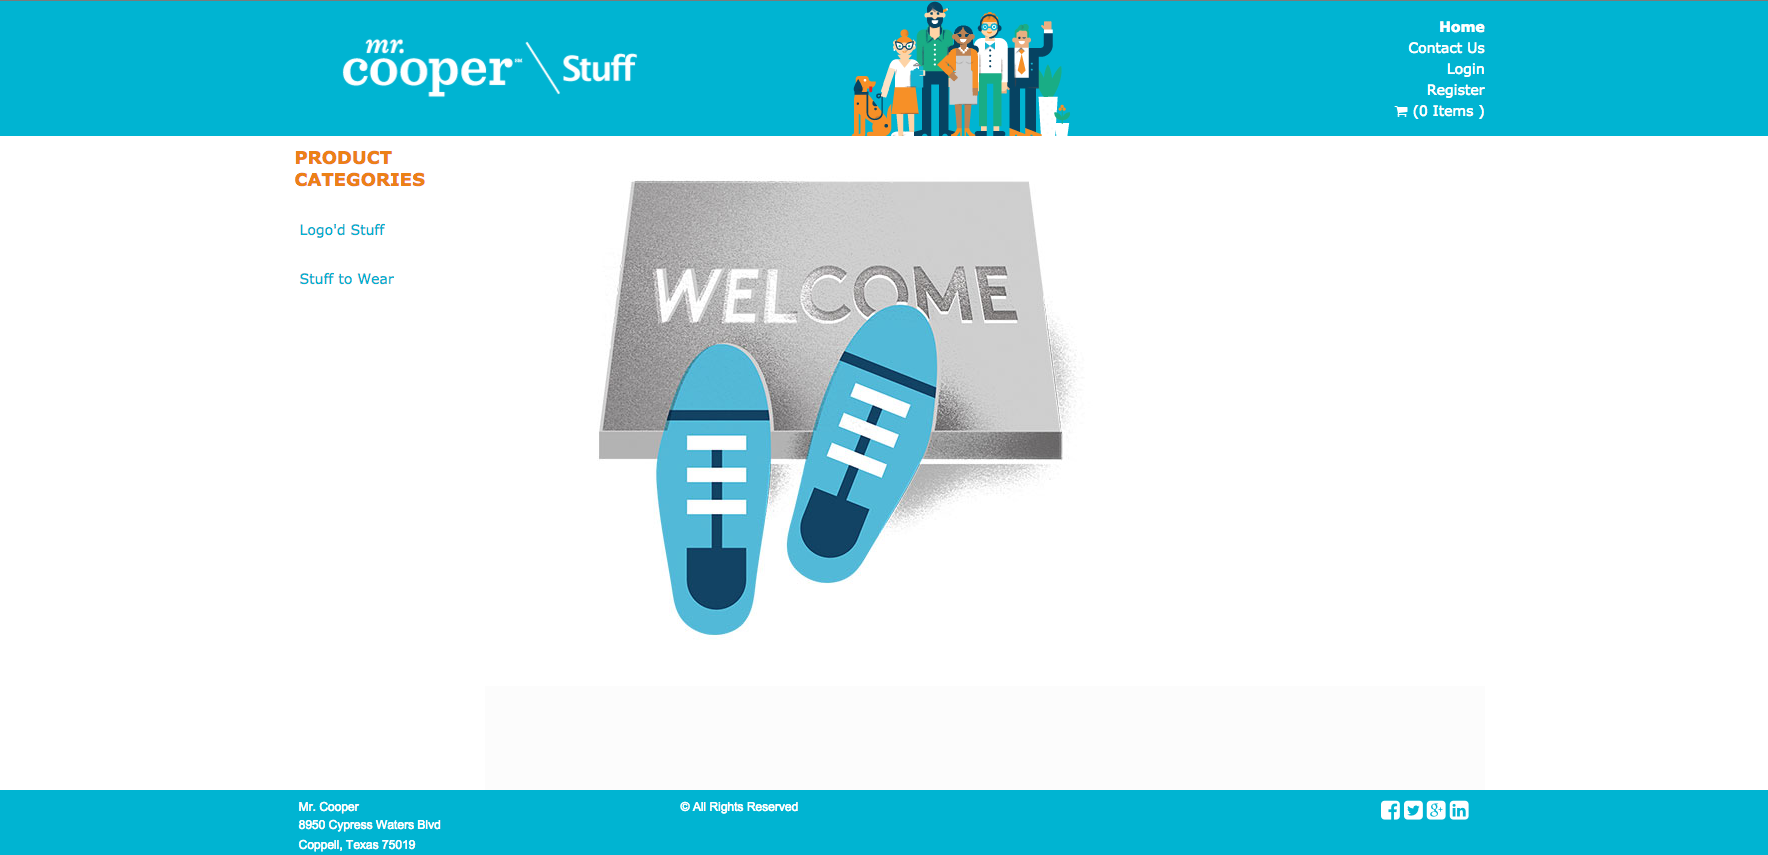 Mr. Cooper online store home